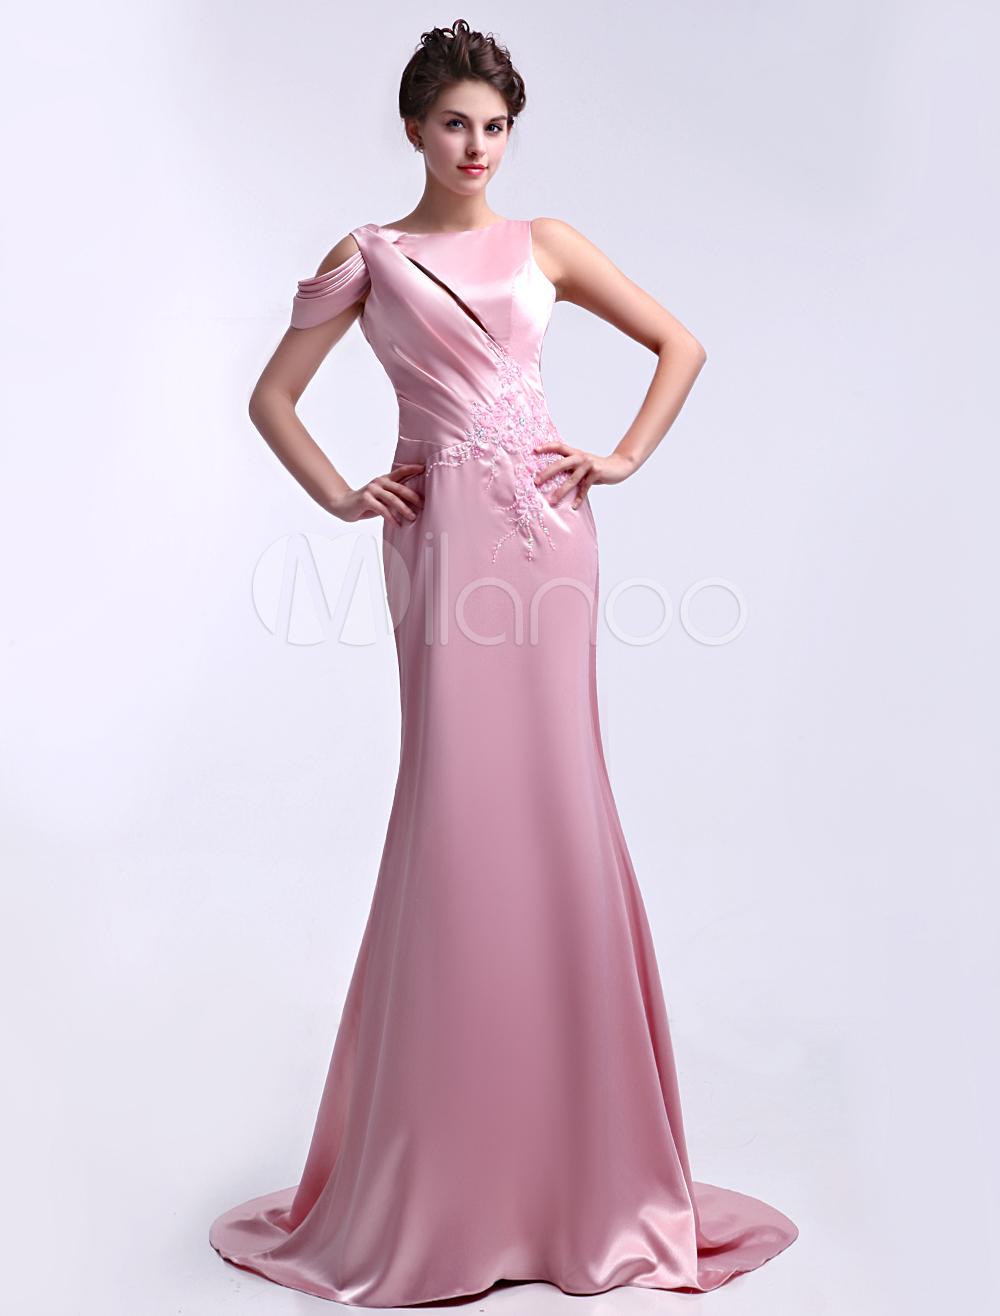 Gorgeous Pink Jewel Neck Pleated Sheath Elastic Woven Satin Evening Dress Milanoo (Wedding Evening Dresses) photo